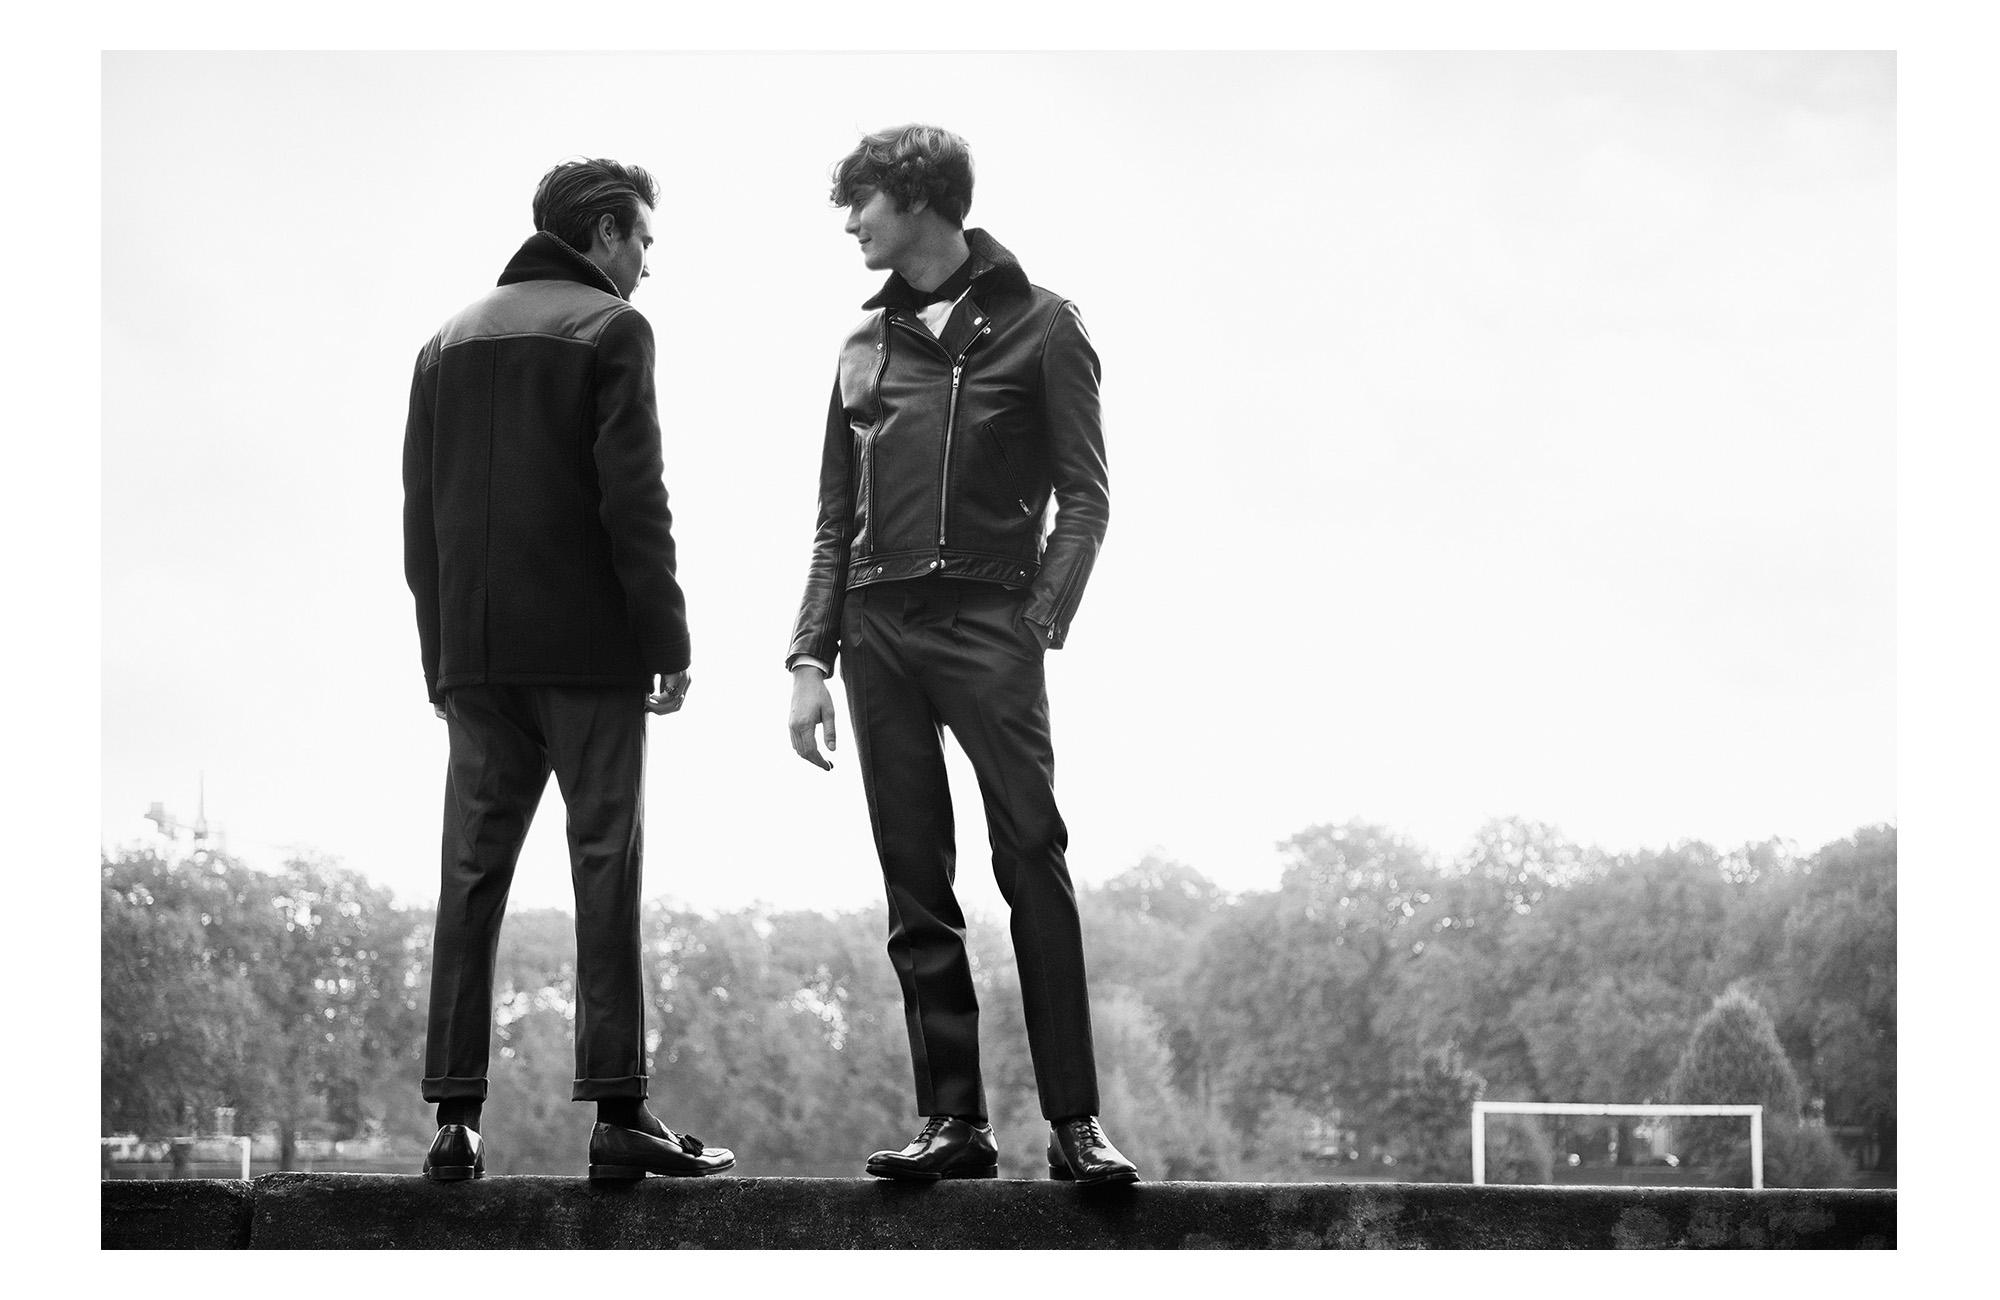 Jocks & Nerds Clapton Park - 1 of 5